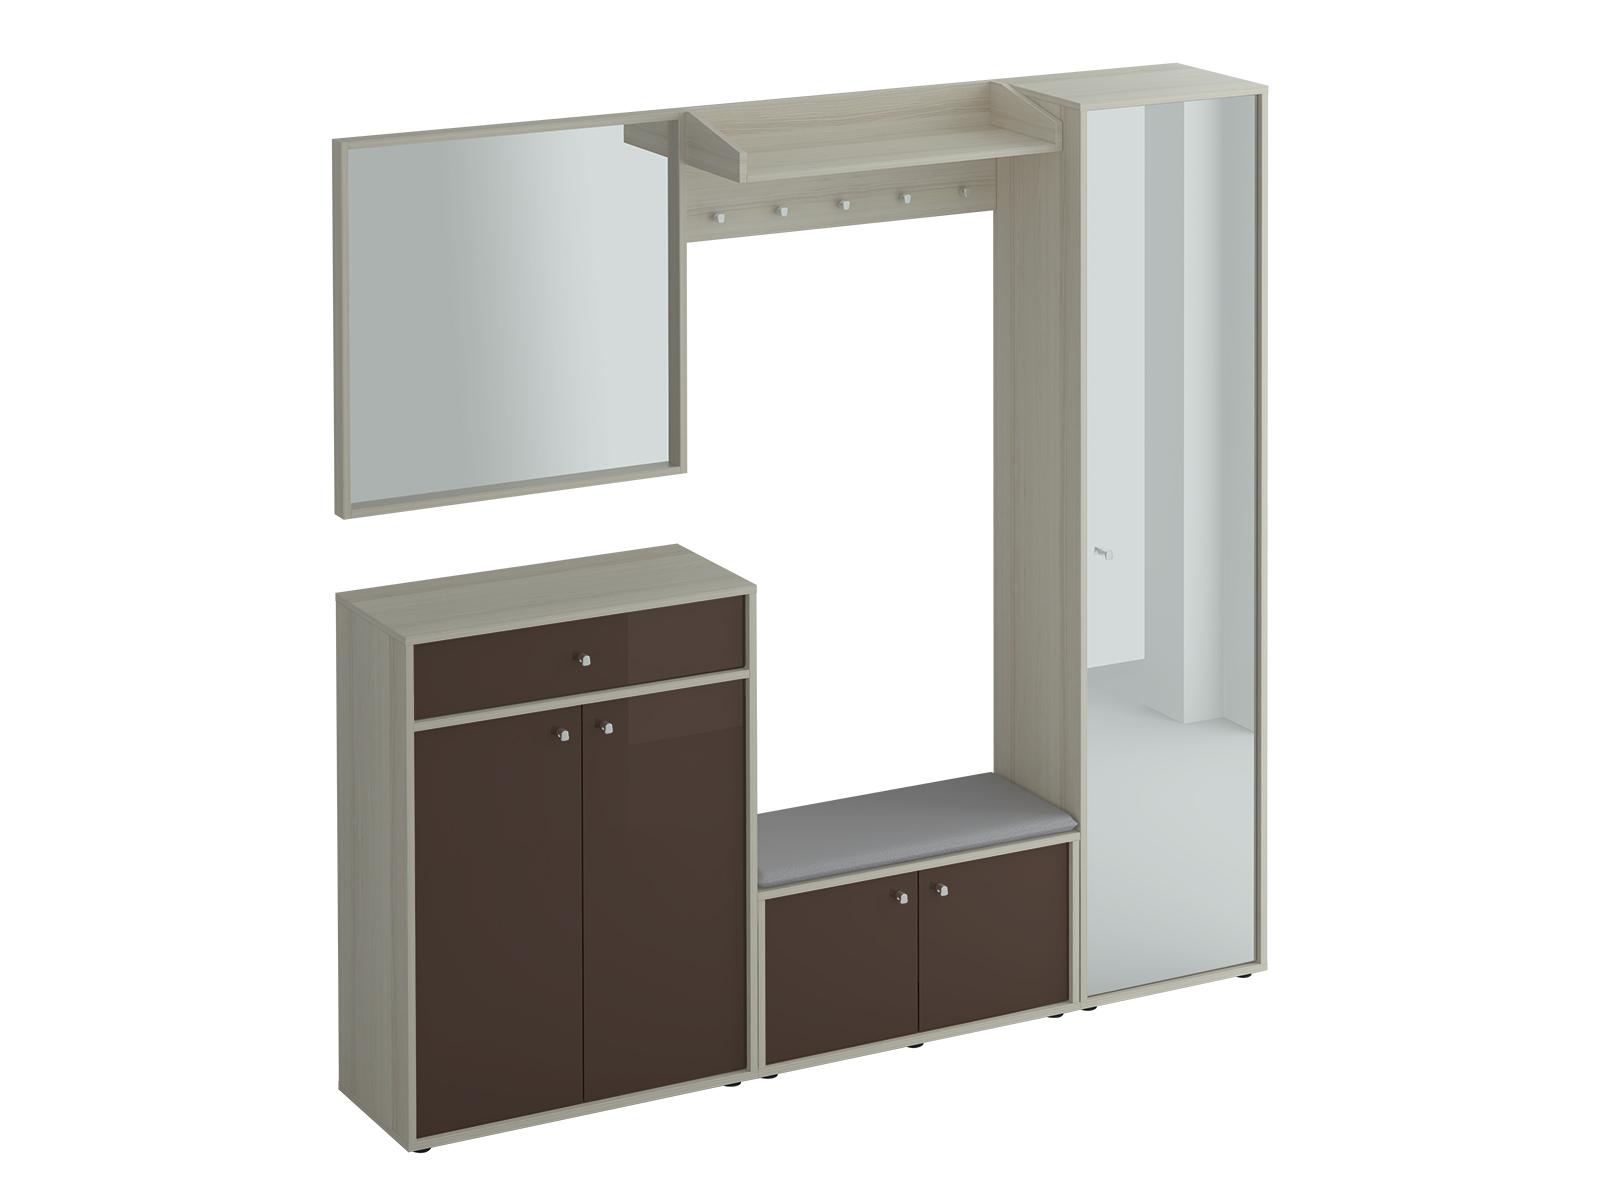 Композиция LatteКомплекты мебели<br>Композиция для прихожей.<br><br>Material: ДСП<br>Width см: 194<br>Depth см: 38<br>Height см: 191